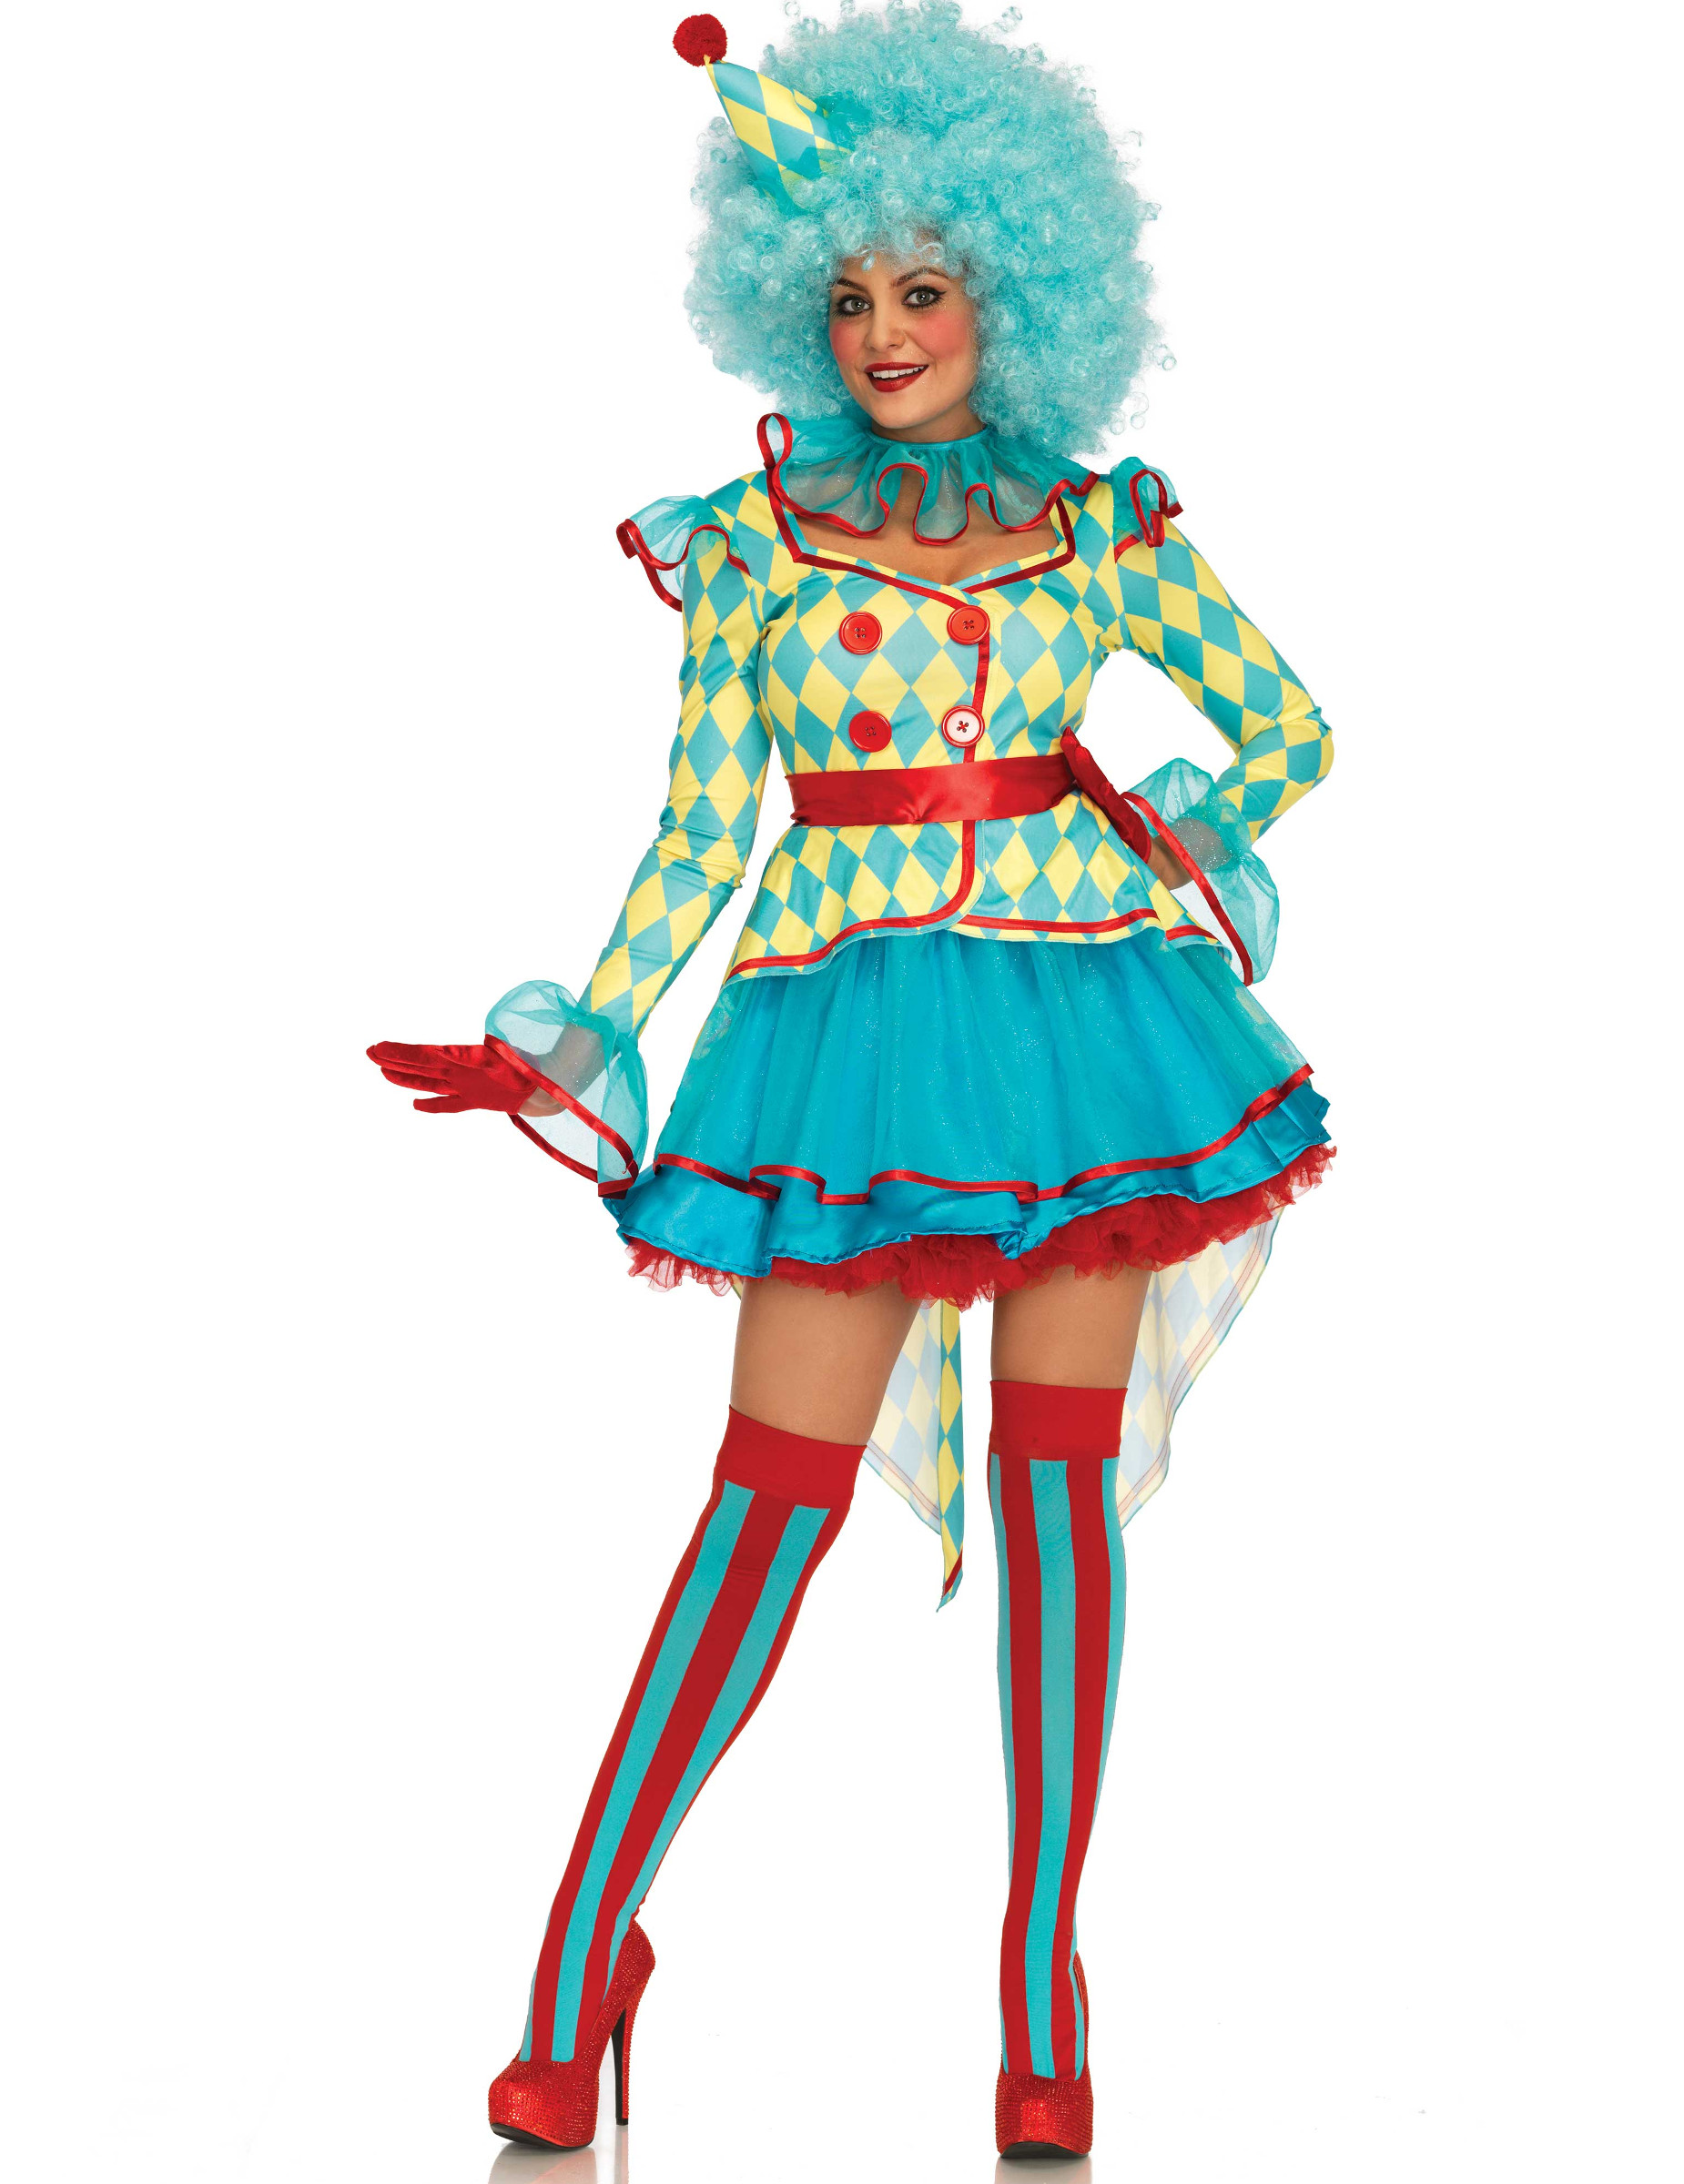 cd2a618216 Costume clown tutù donna: Costumi adulti,e vestiti di carnevale ...